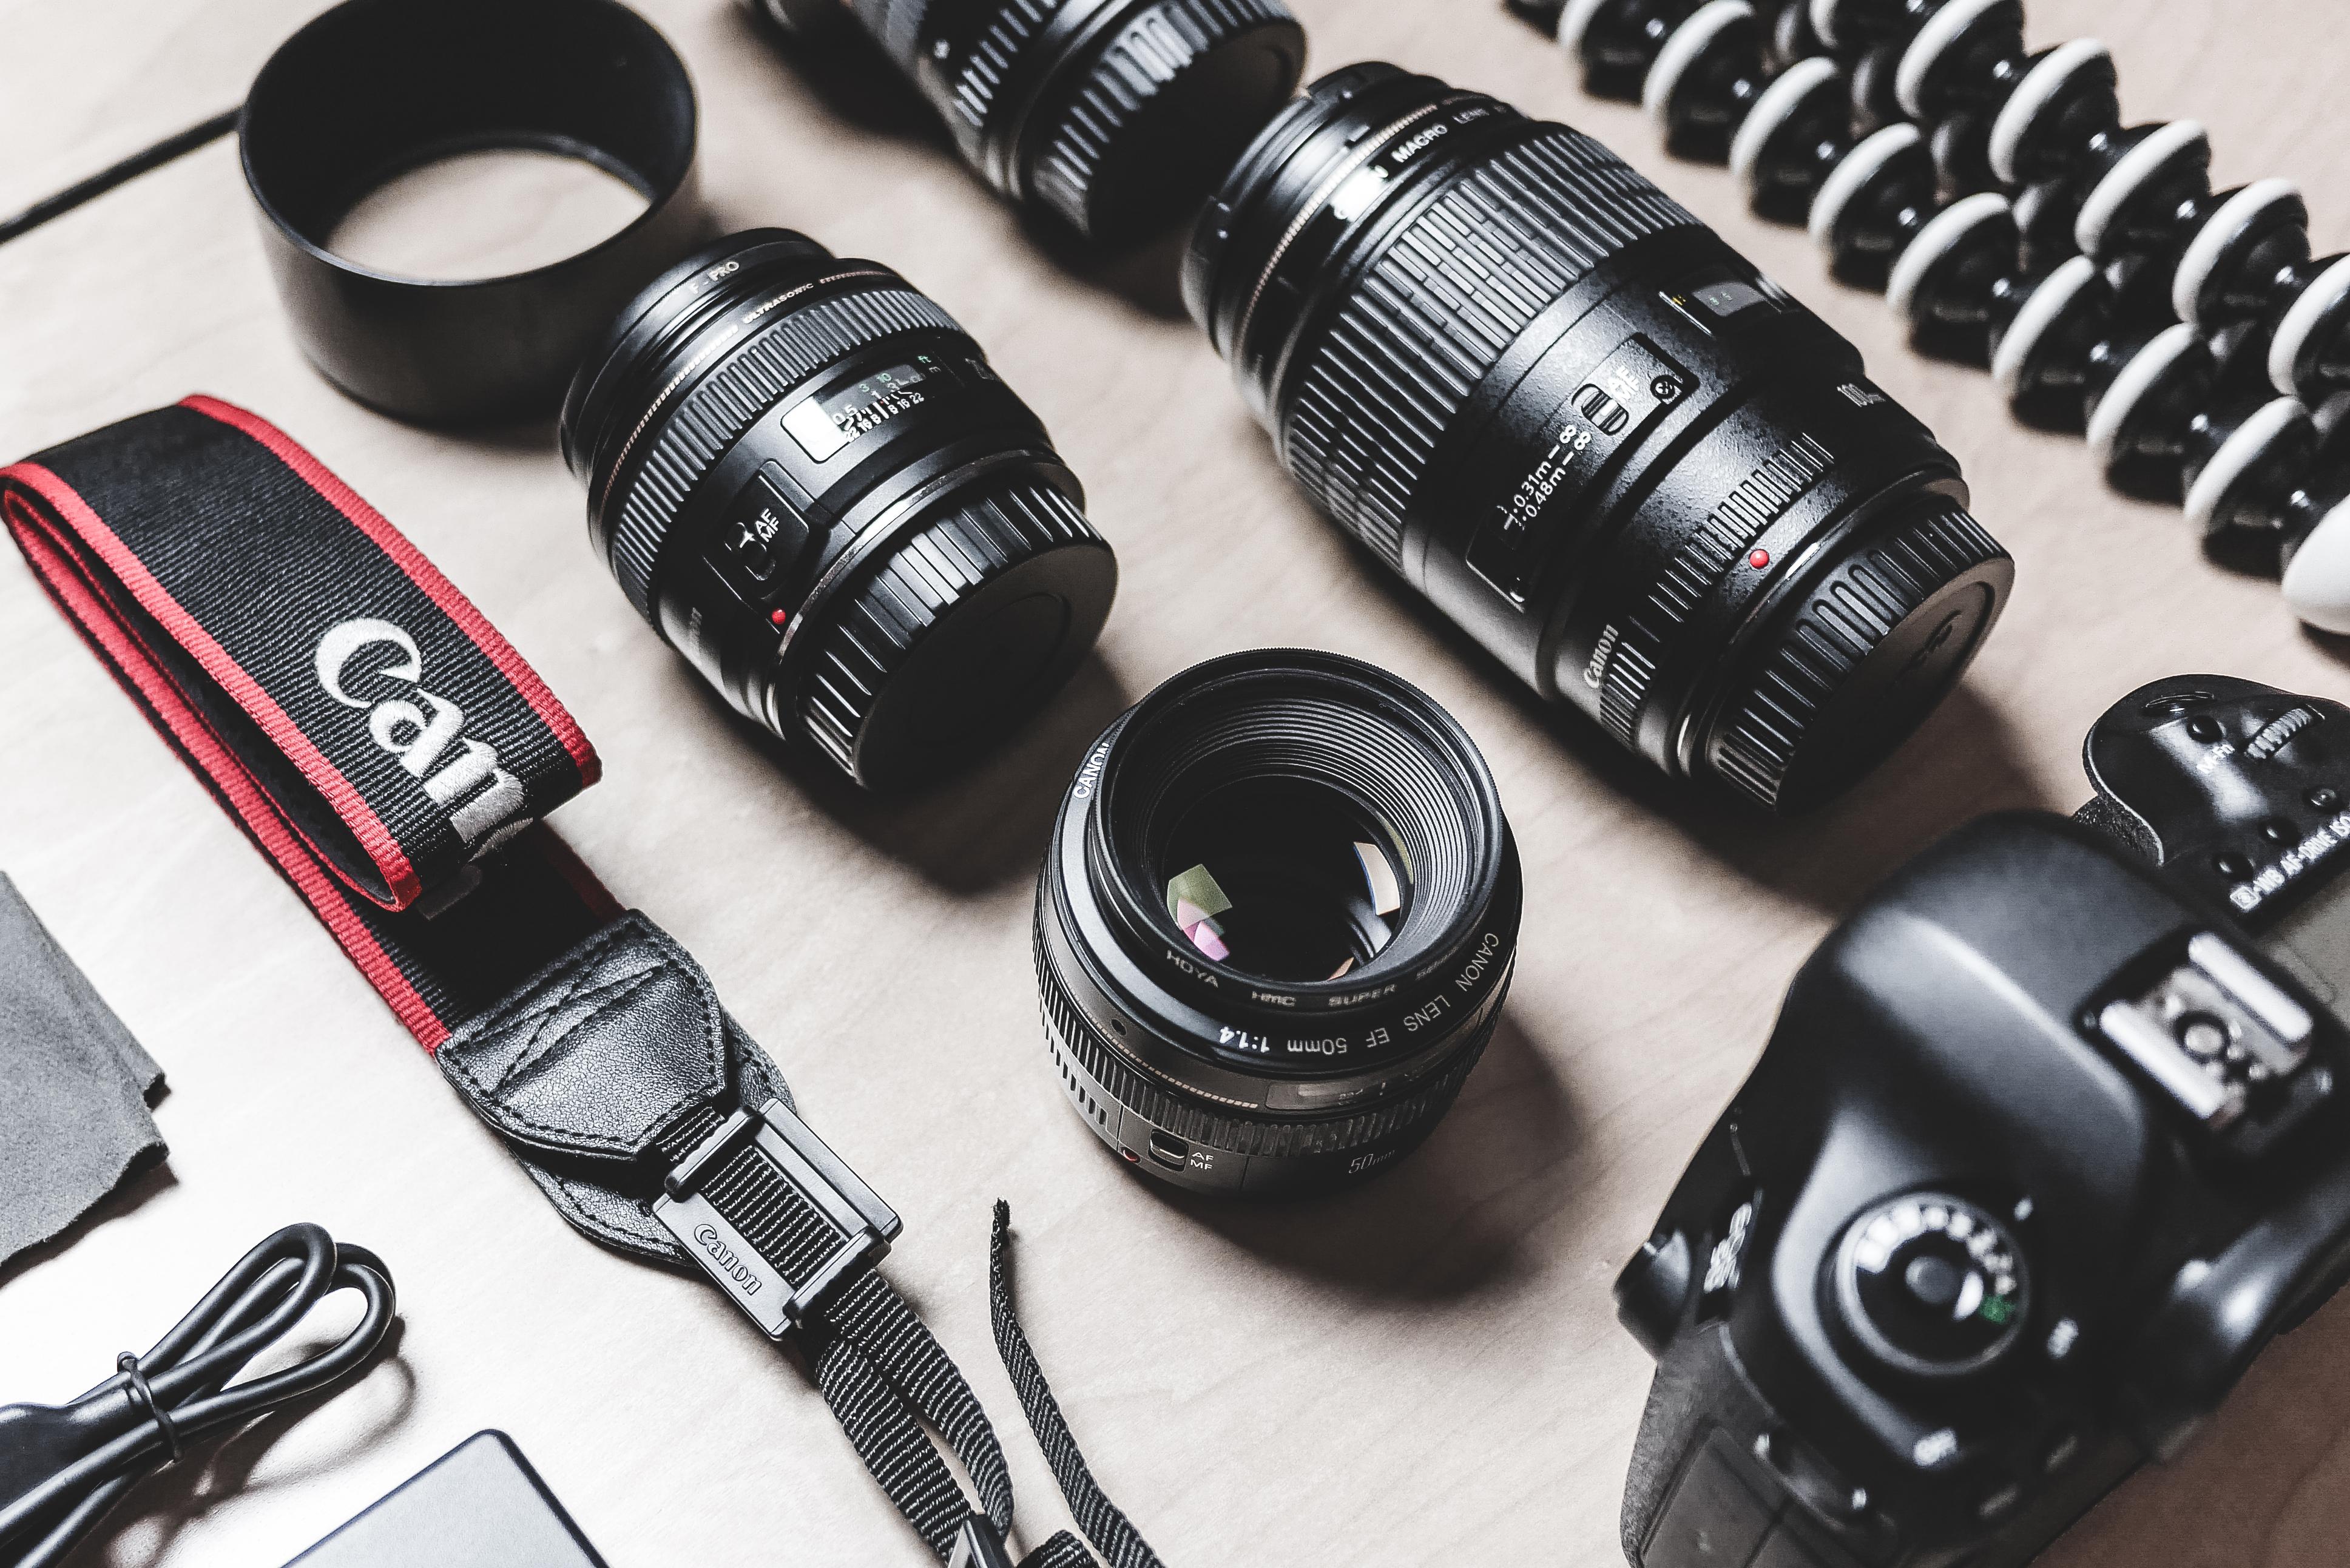 professional-photographer-dslr-camera-le